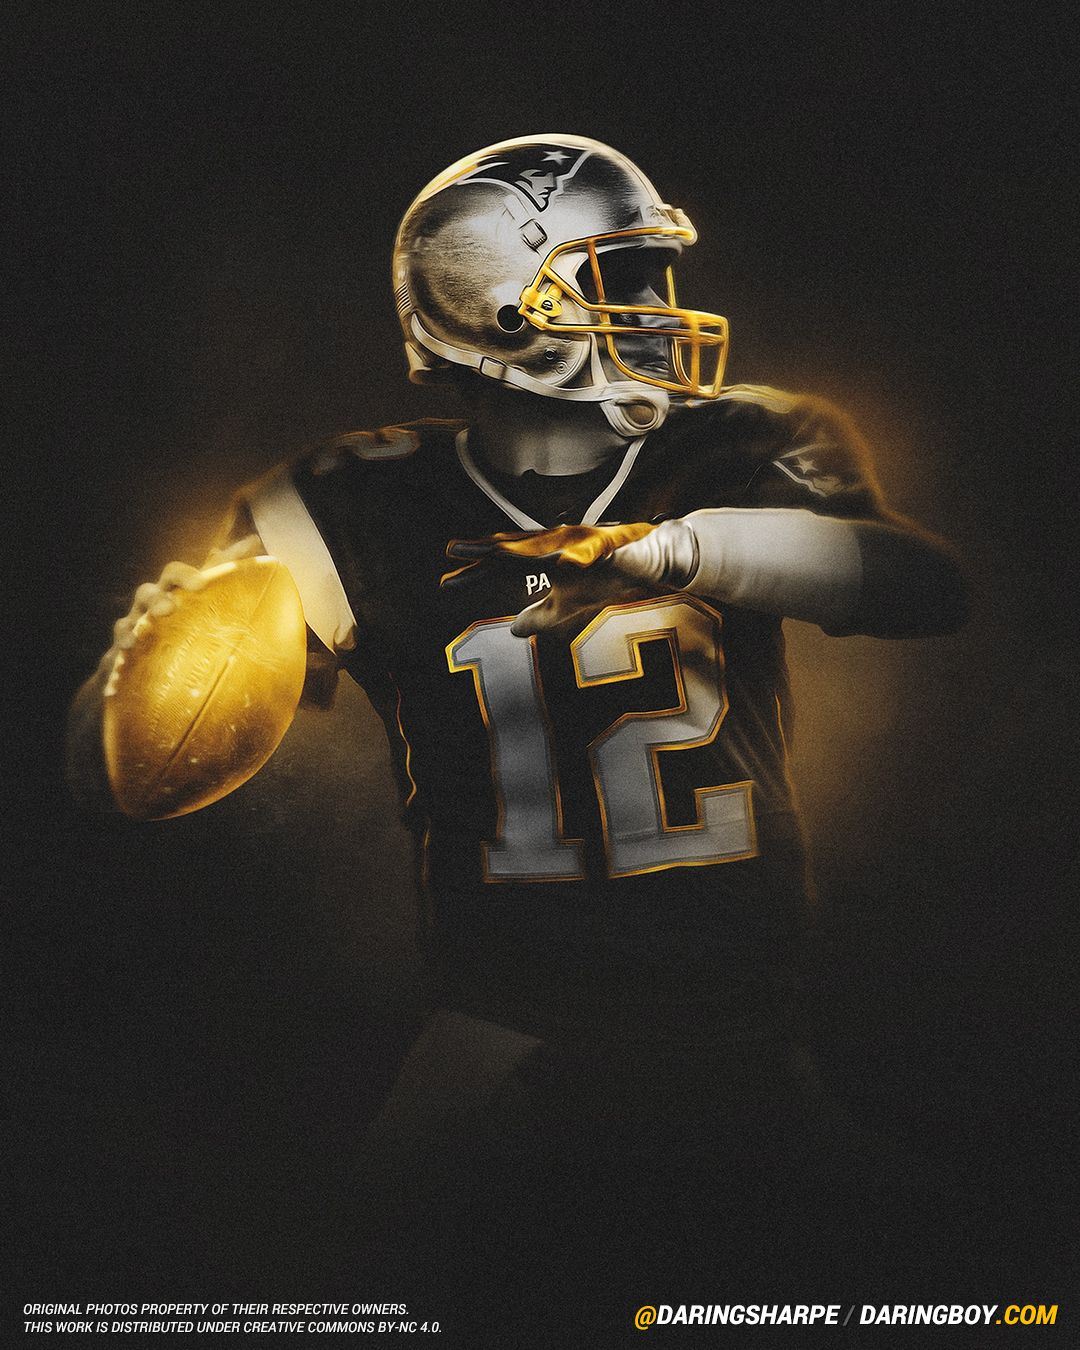 Tom Brady New England Patriots New England Patriots Players New England Patriots Wallpaper New England Patriots